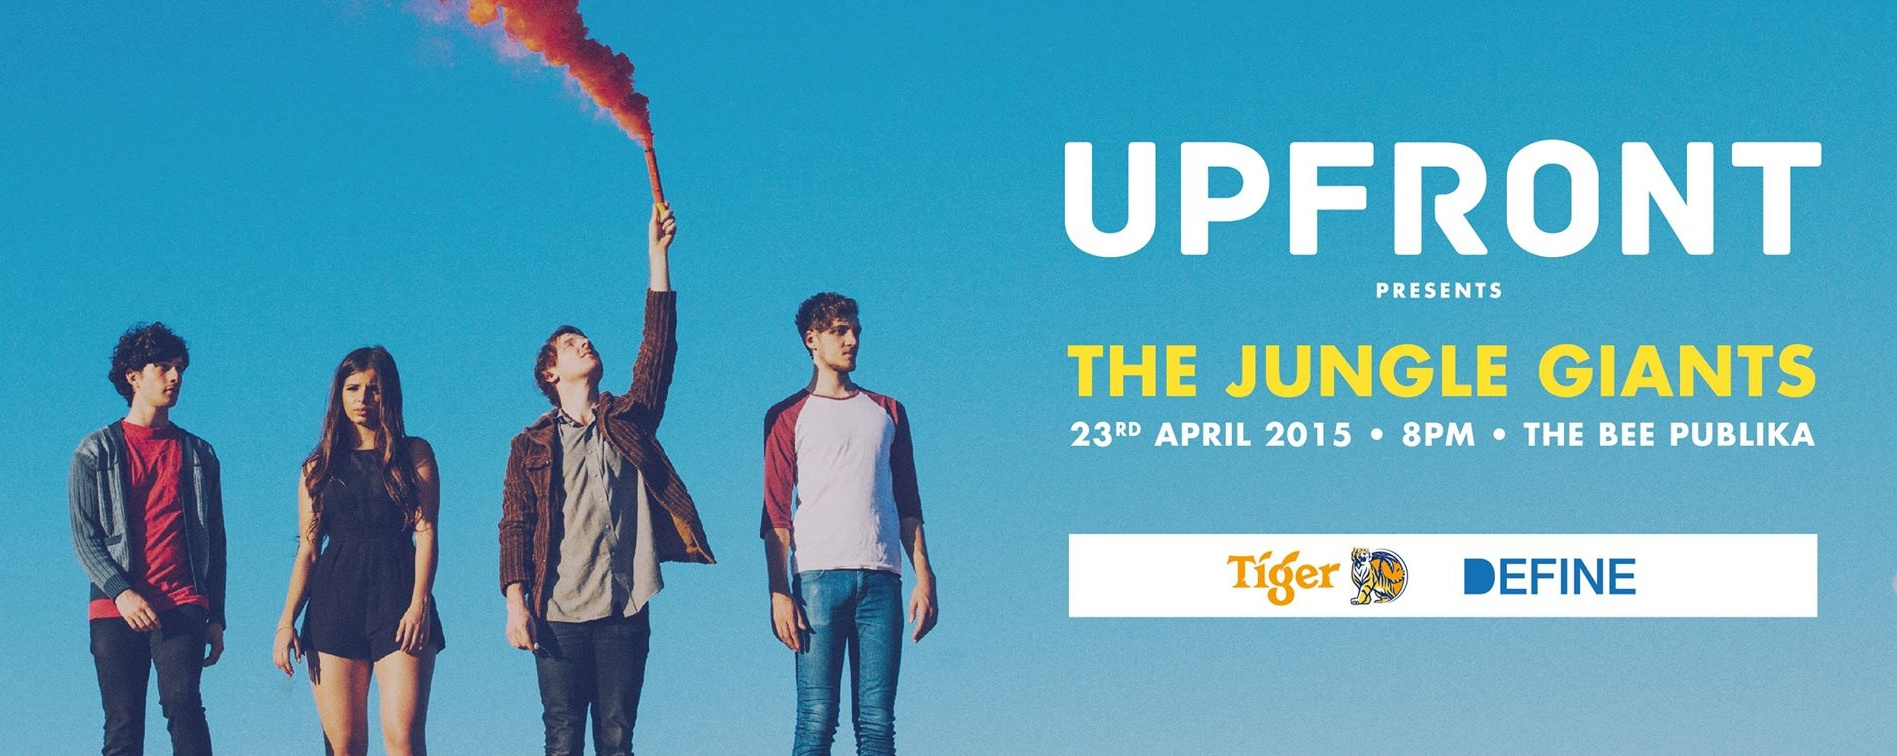 Upfront Presents The Jungle Giants